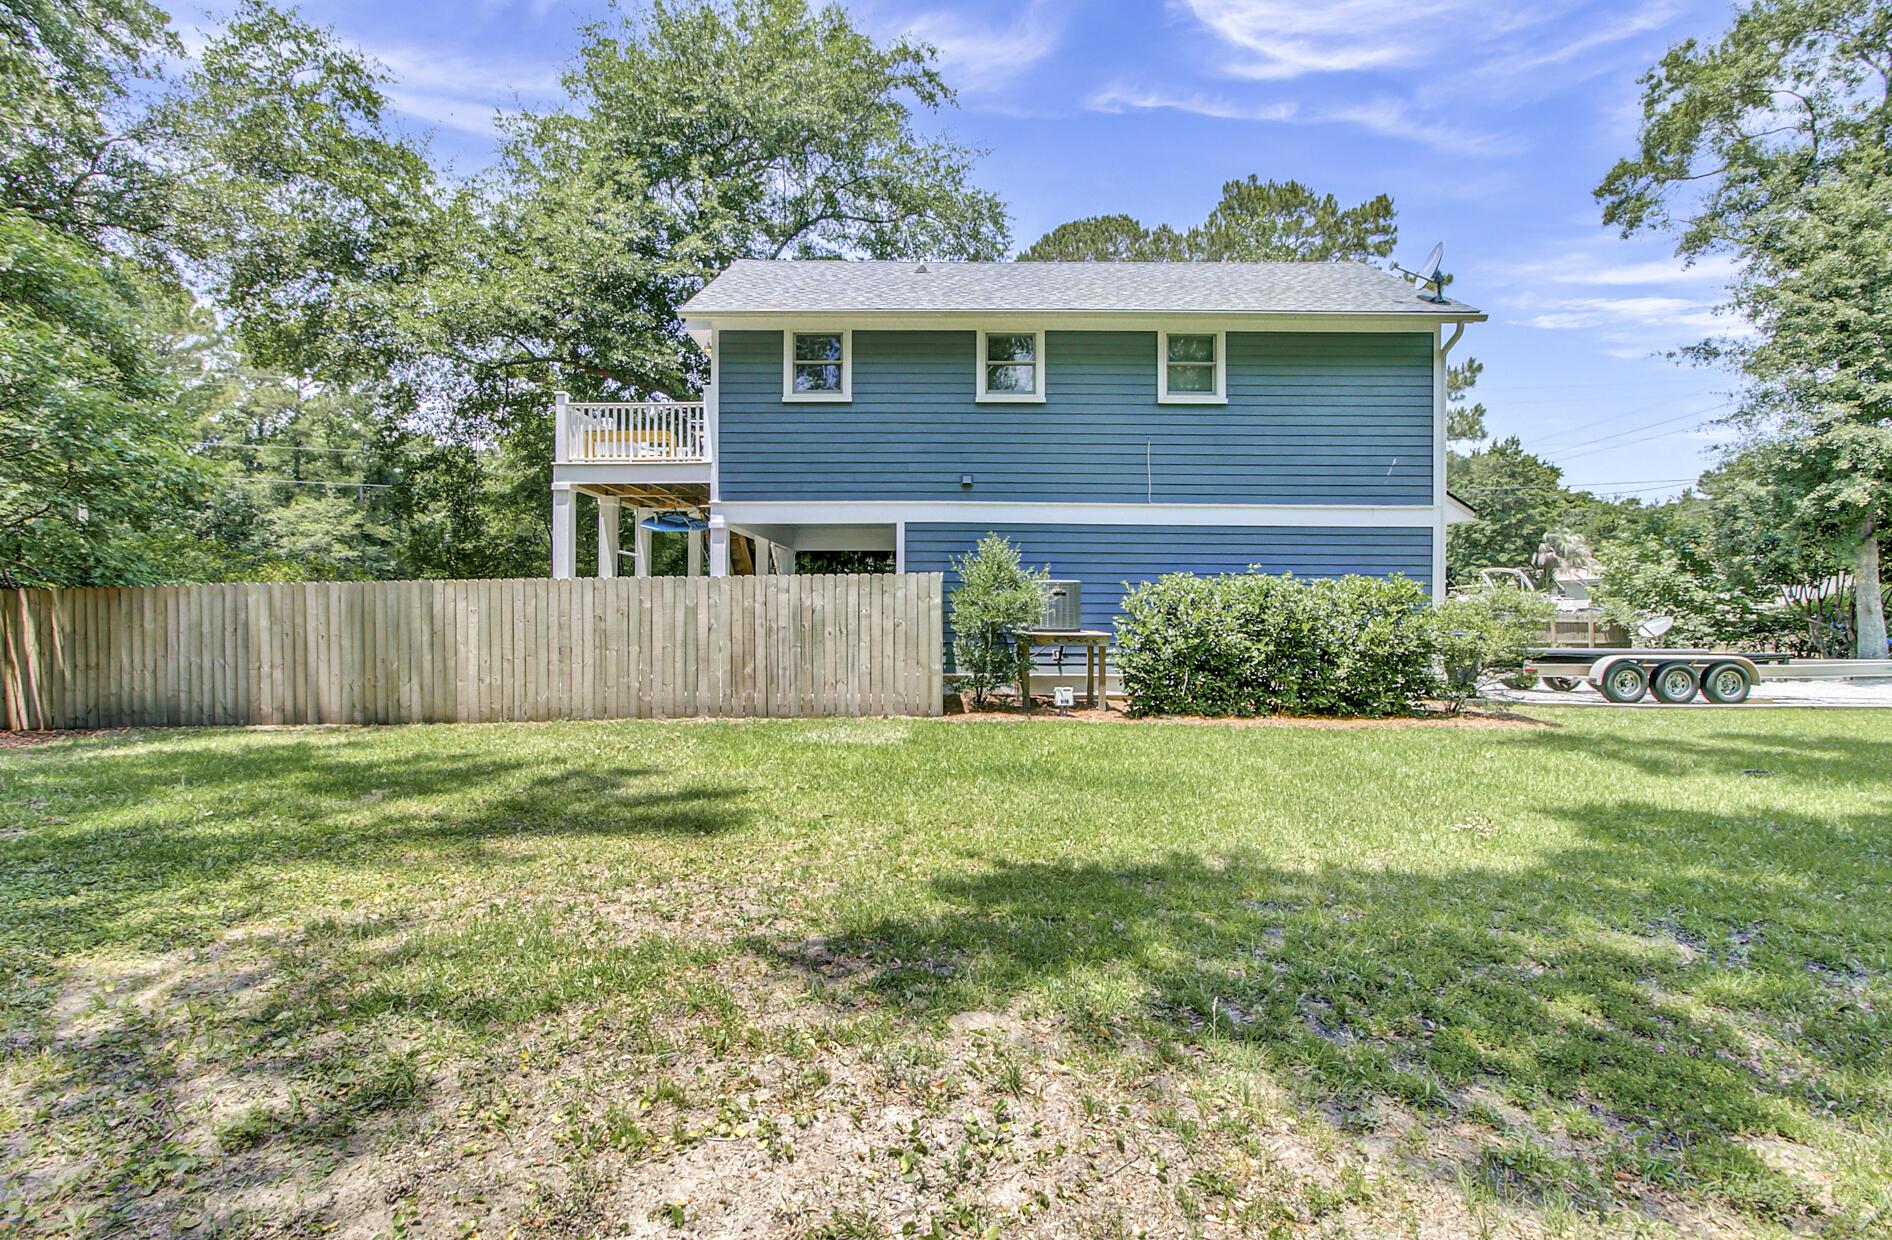 Yaugh Hall Homes For Sale - 1229 Porchers Bluff, Mount Pleasant, SC - 43